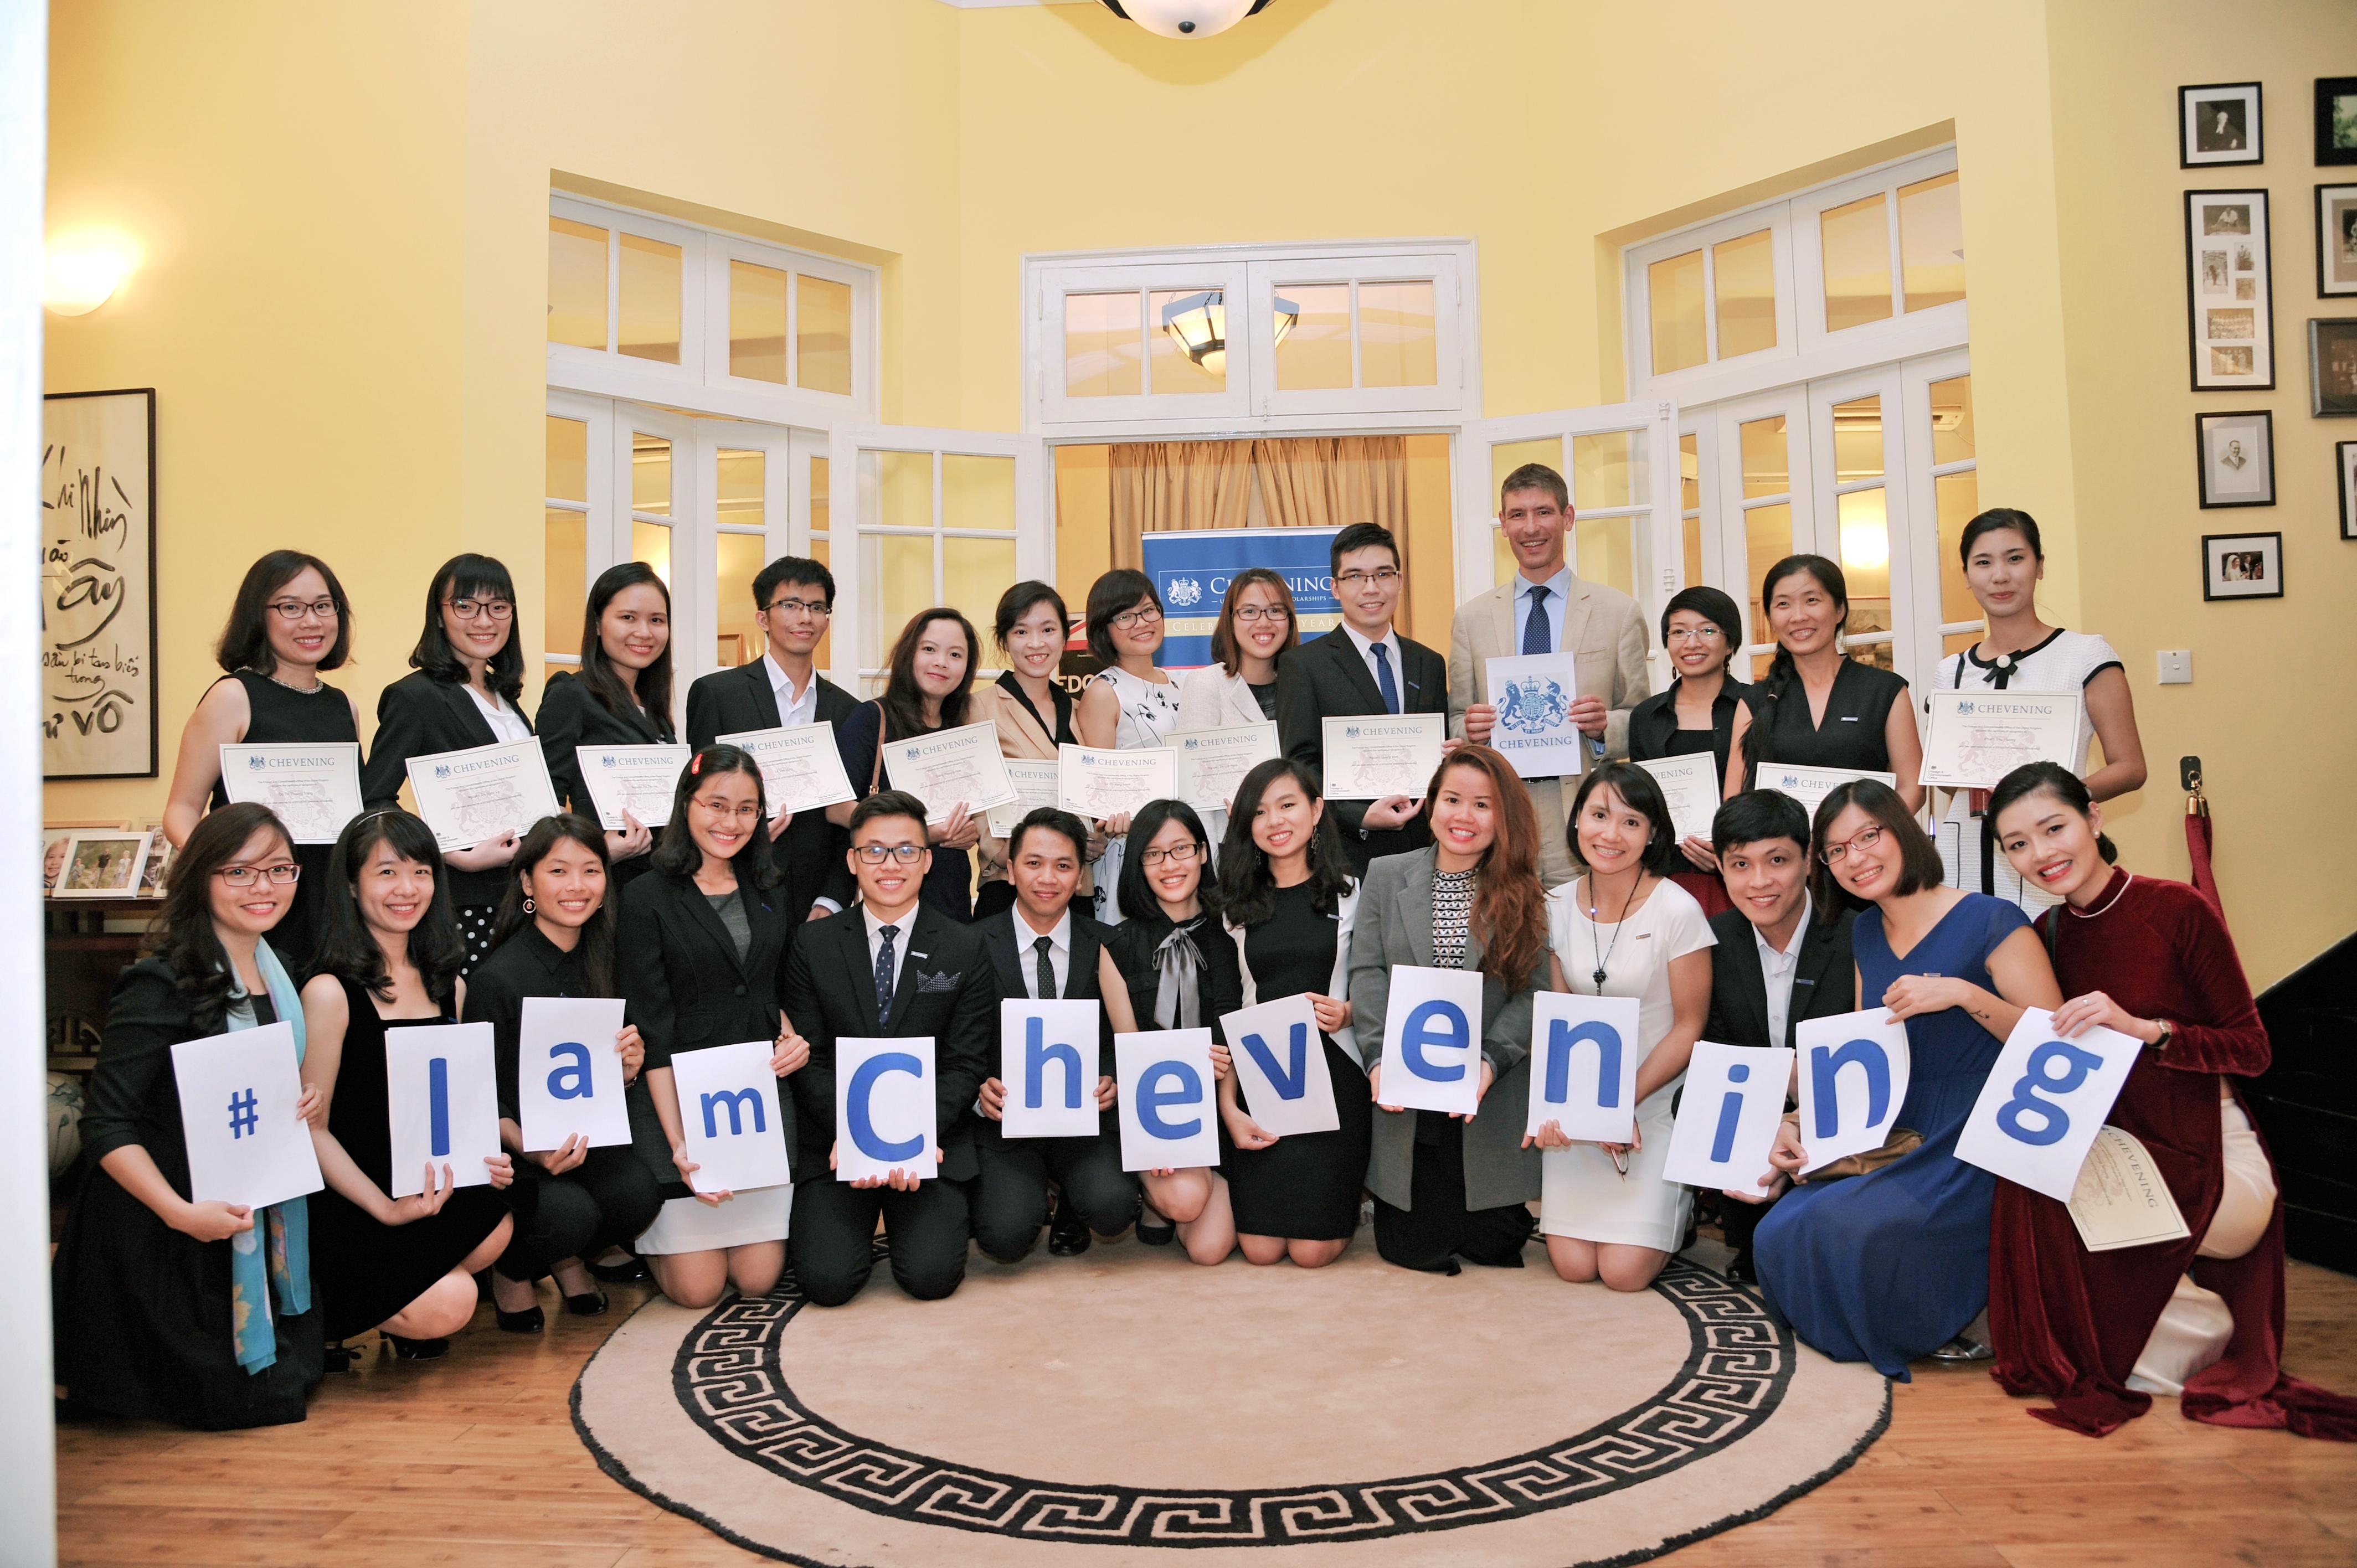 Chevening scholars 2015-2016